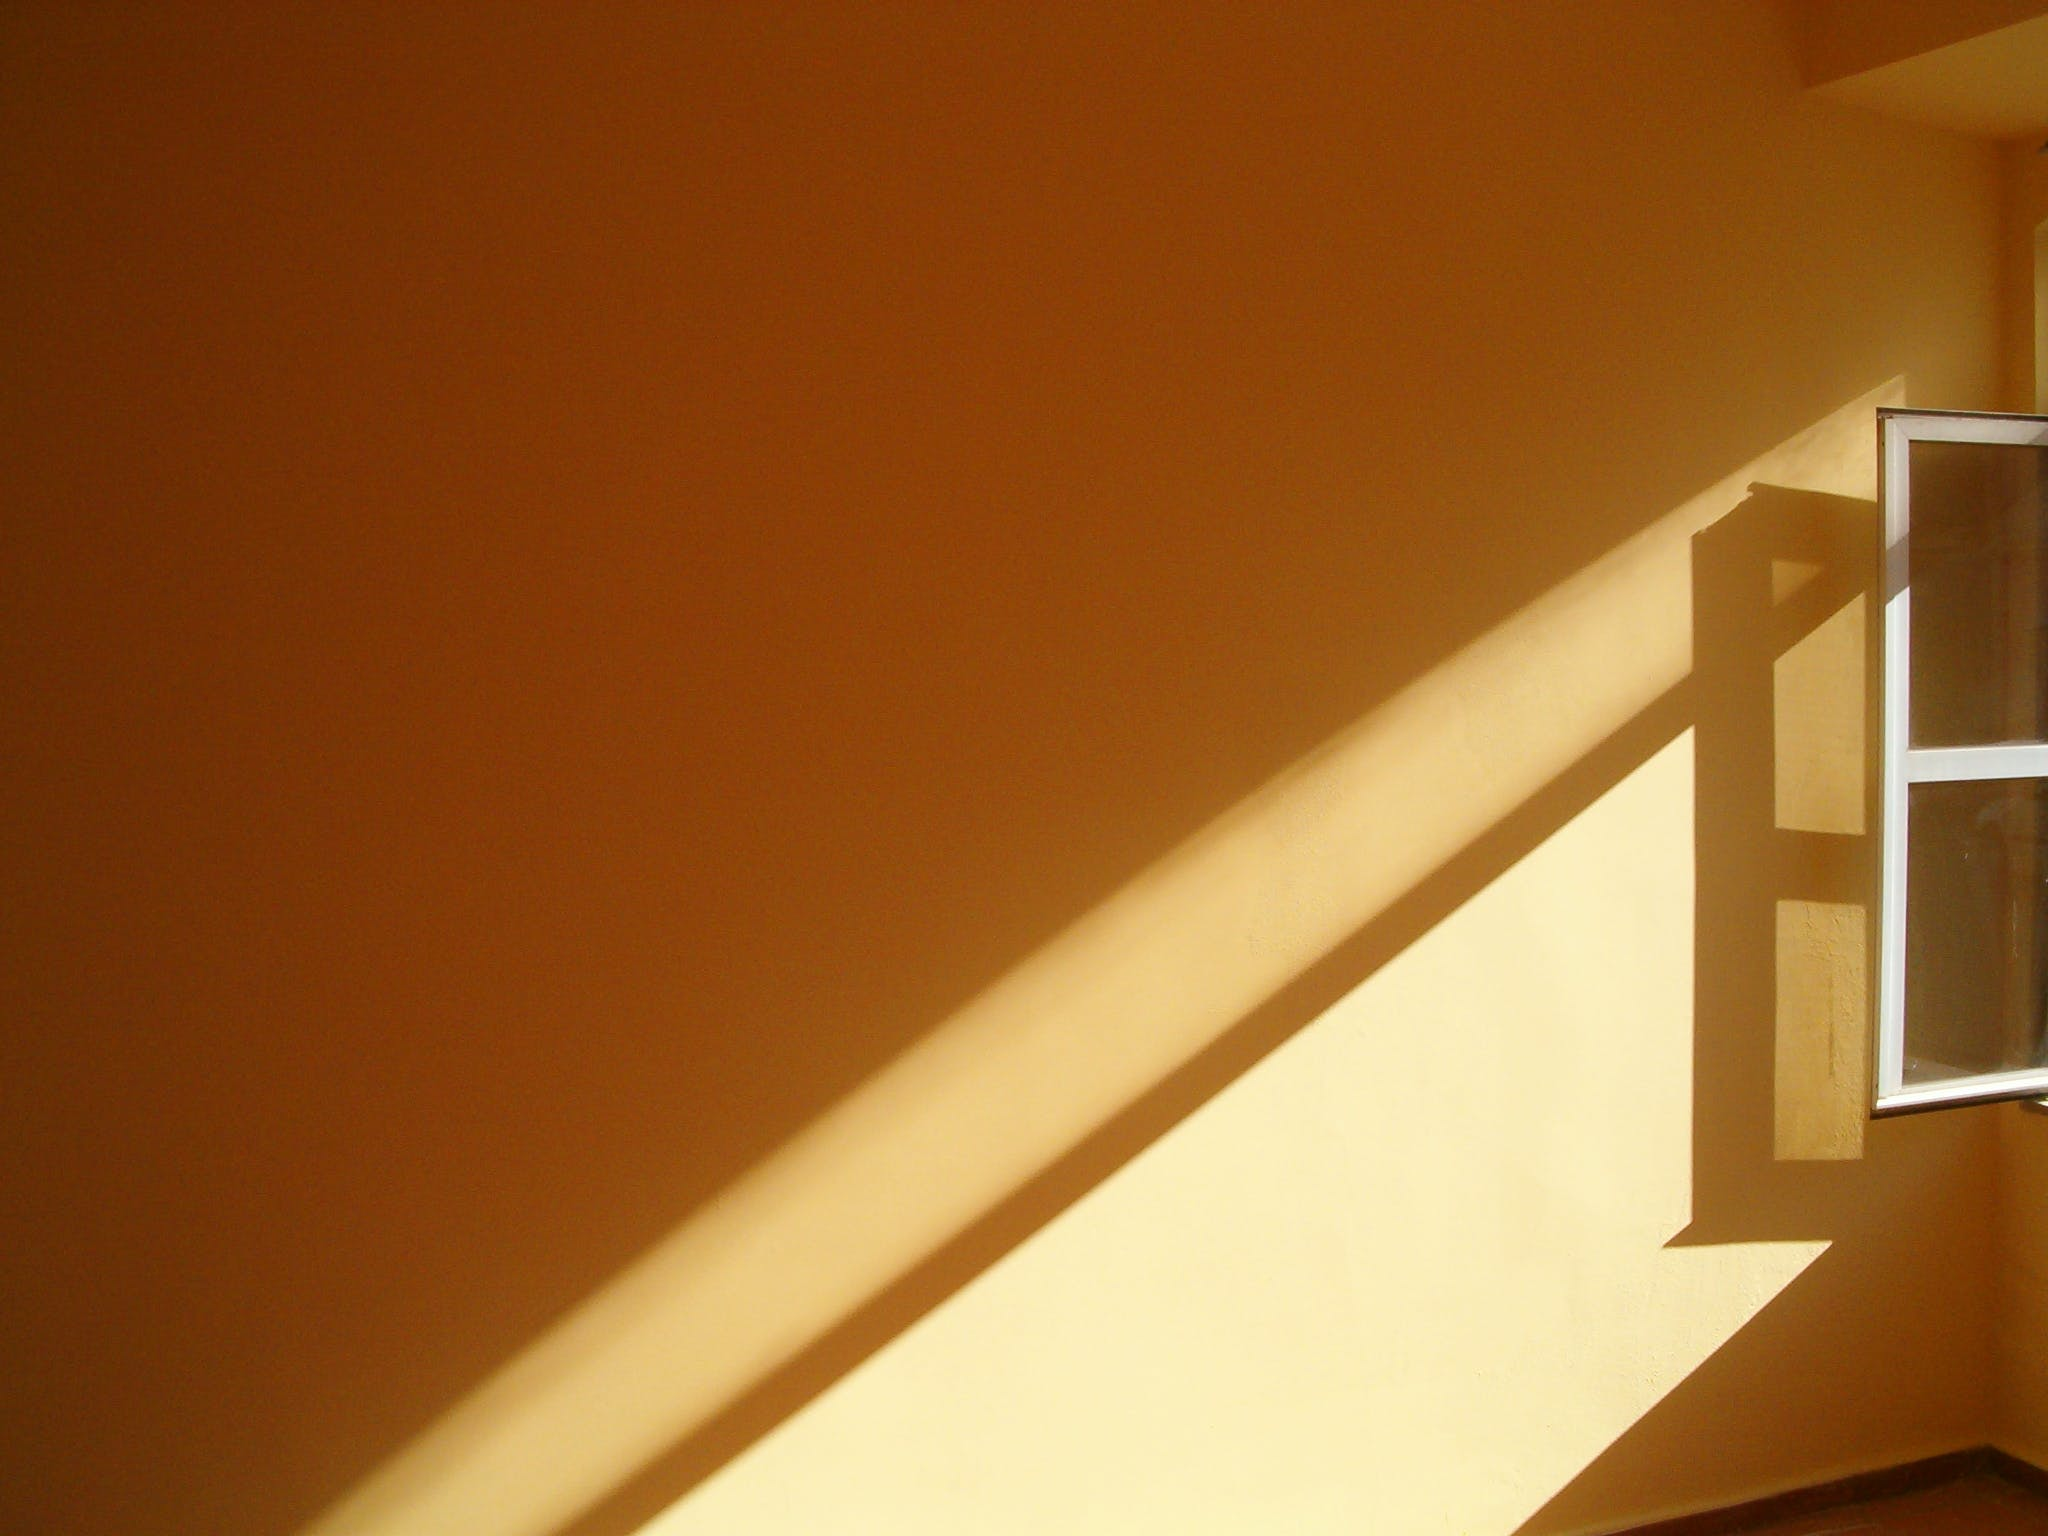 indoor, interior, light